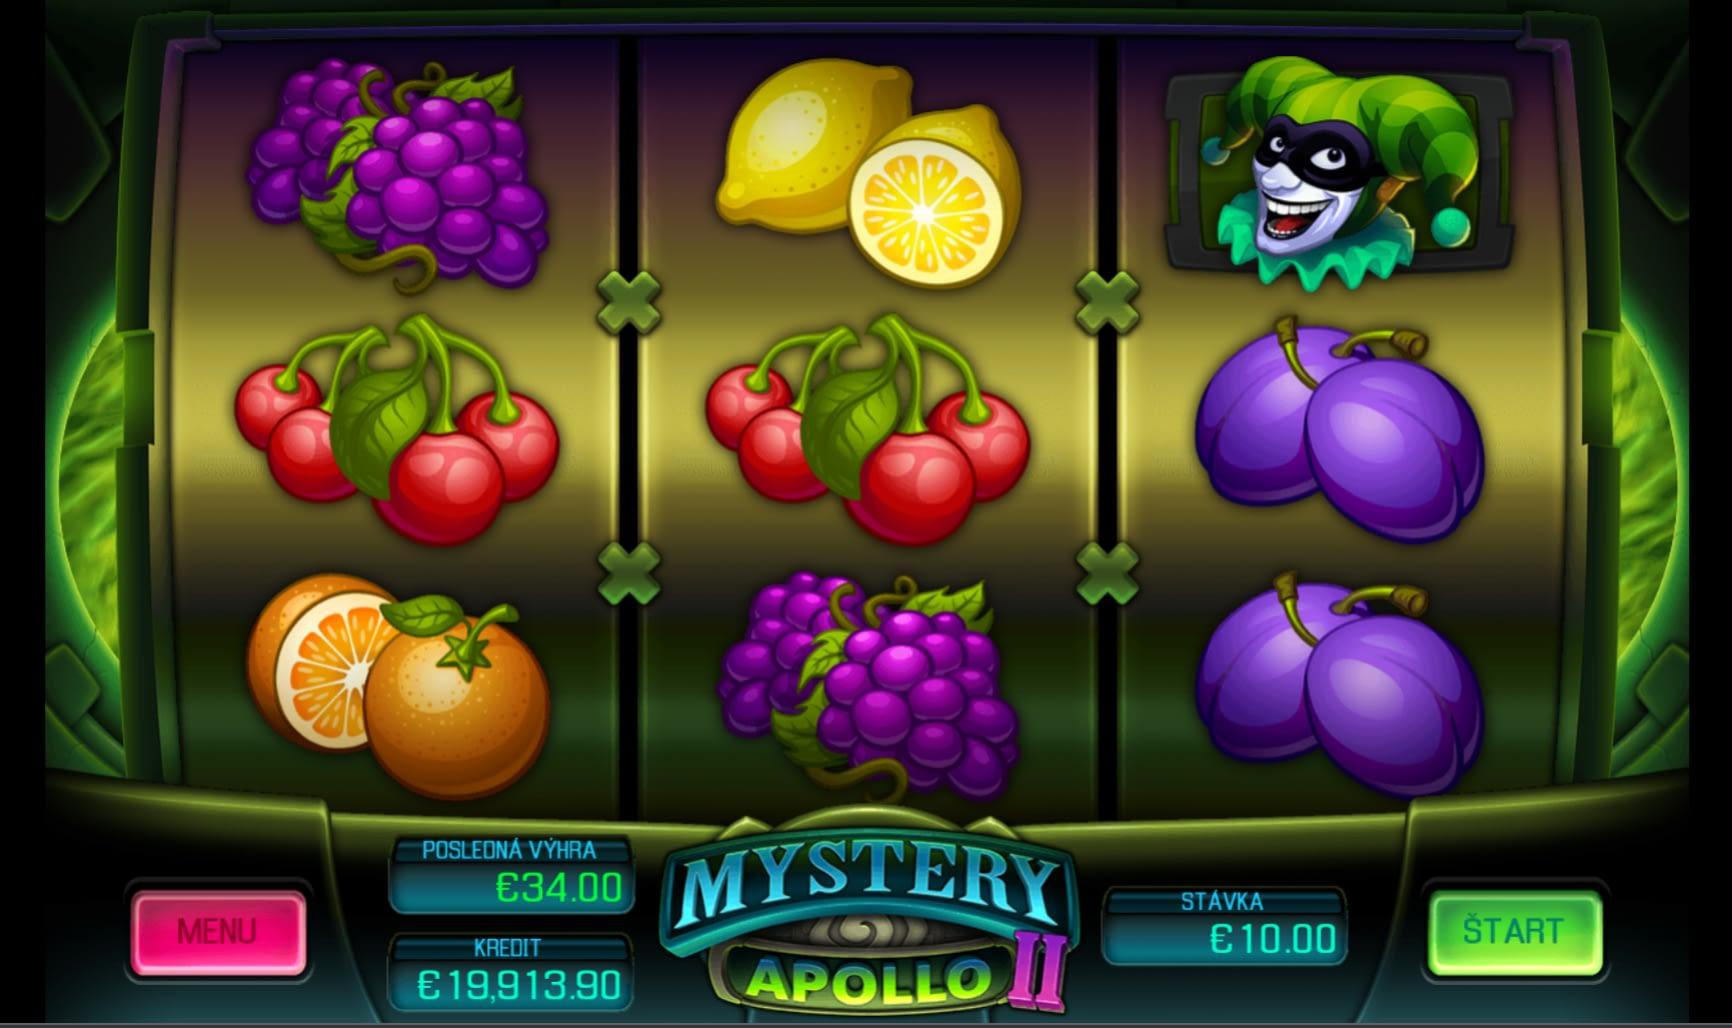 Mystery Apollo od Apollo Games v online kasíne od Fortuny.